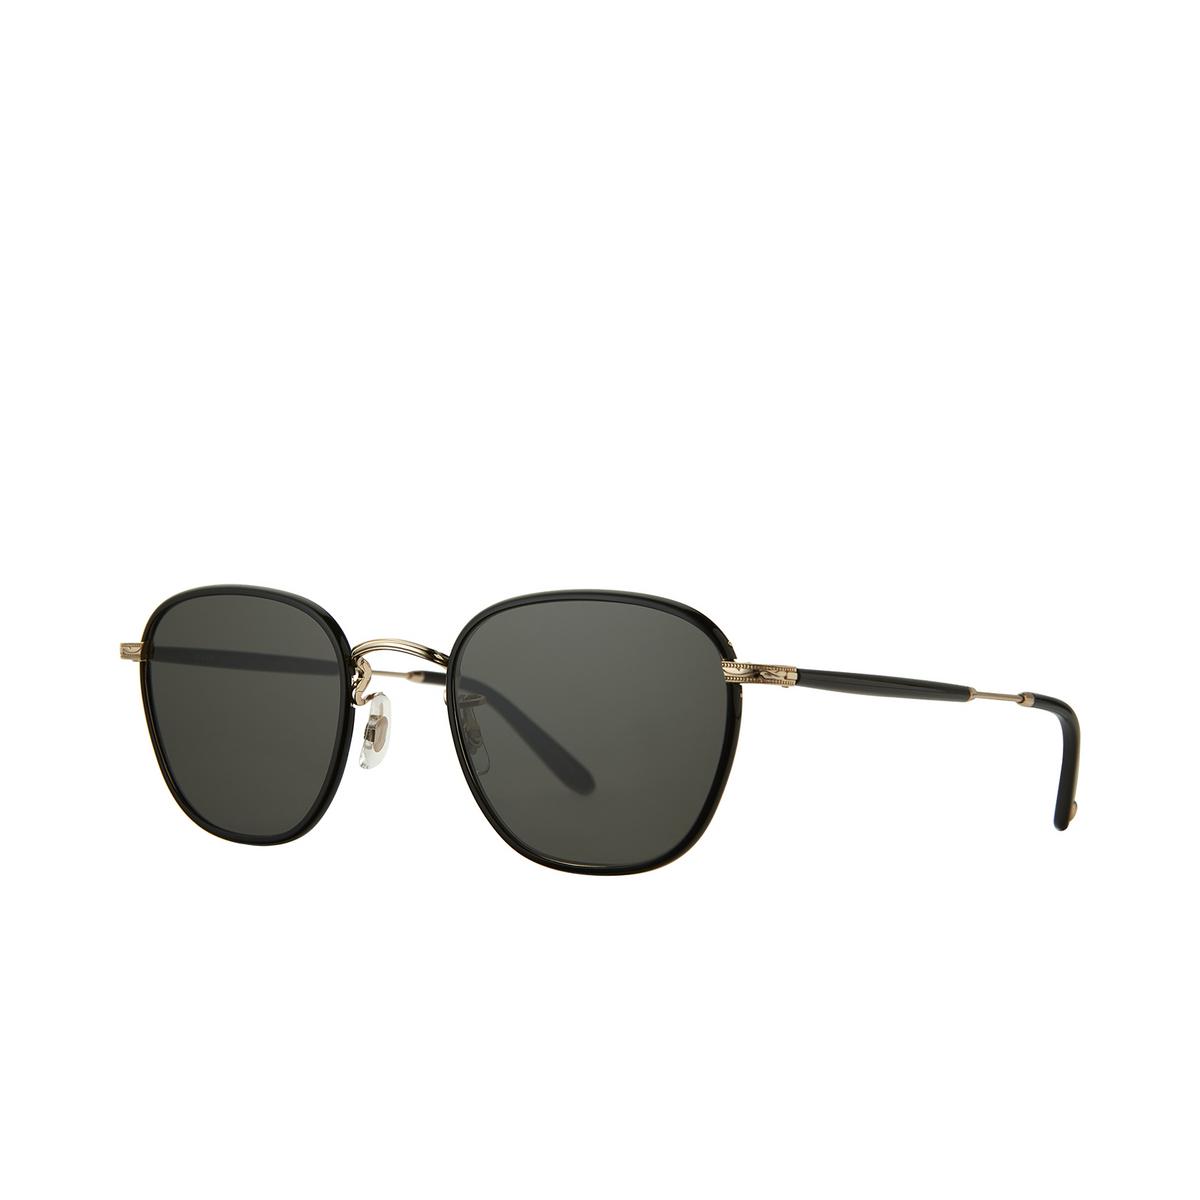 Garrett Leight® Square Sunglasses: Grant Sun color Black - Black Bk-g-bk/sfpgy - 2/2.